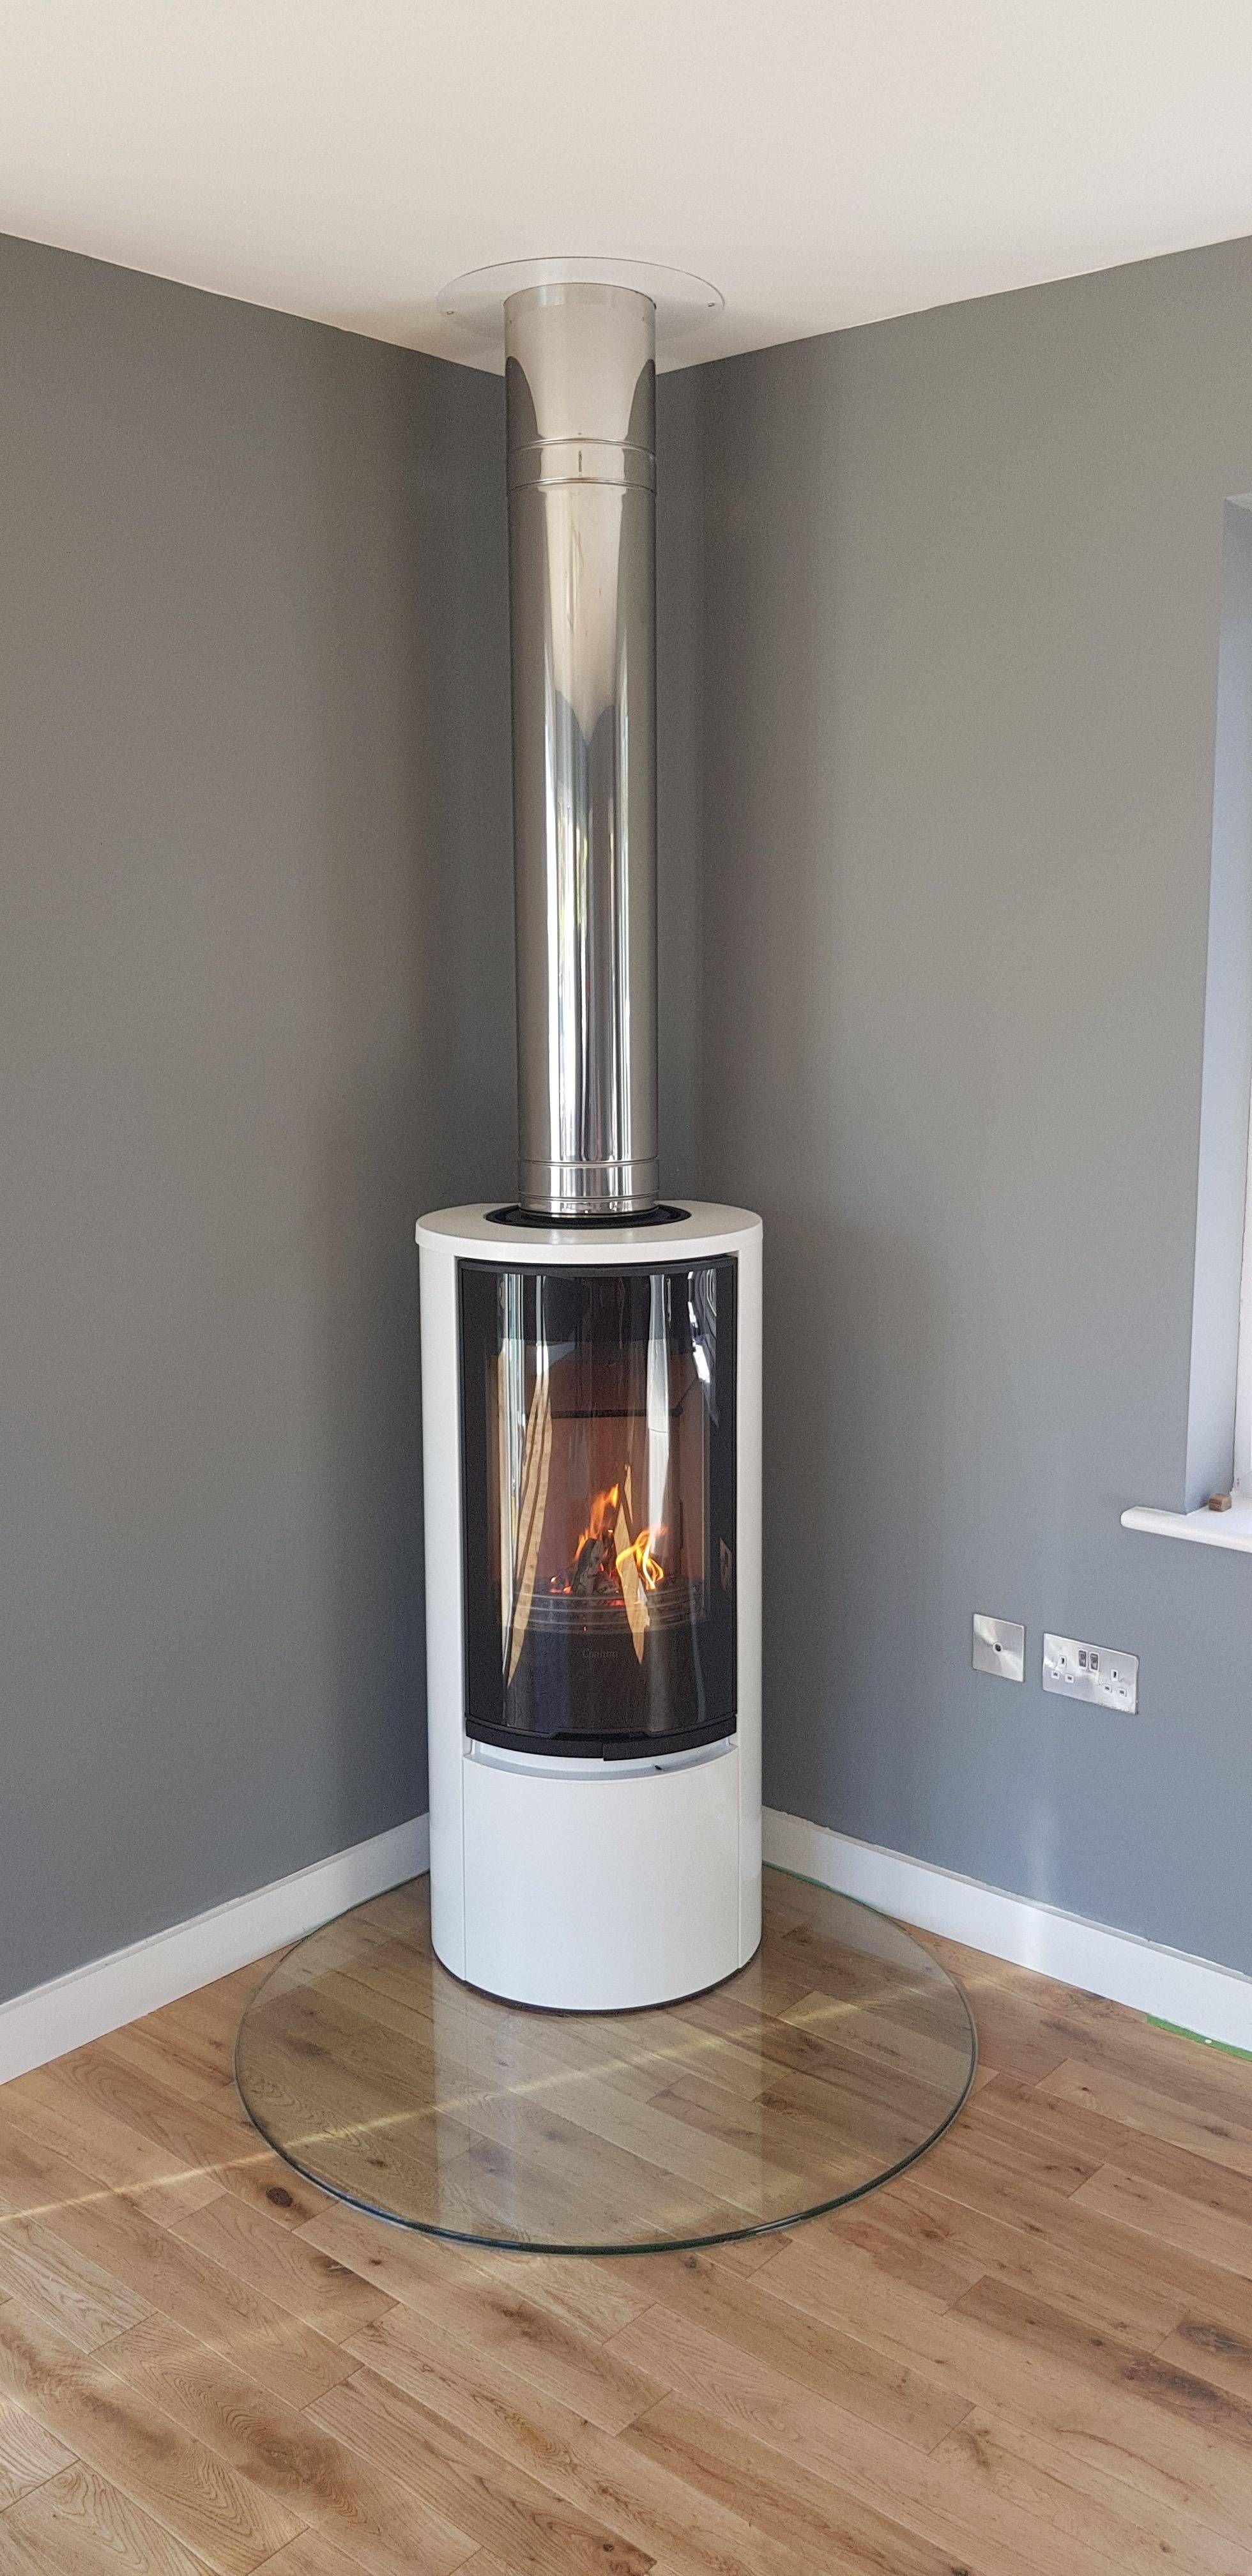 Free Standing Fireplace Wood Burning Fireplace Inserts Standing Fireplace Installing A Fireplace